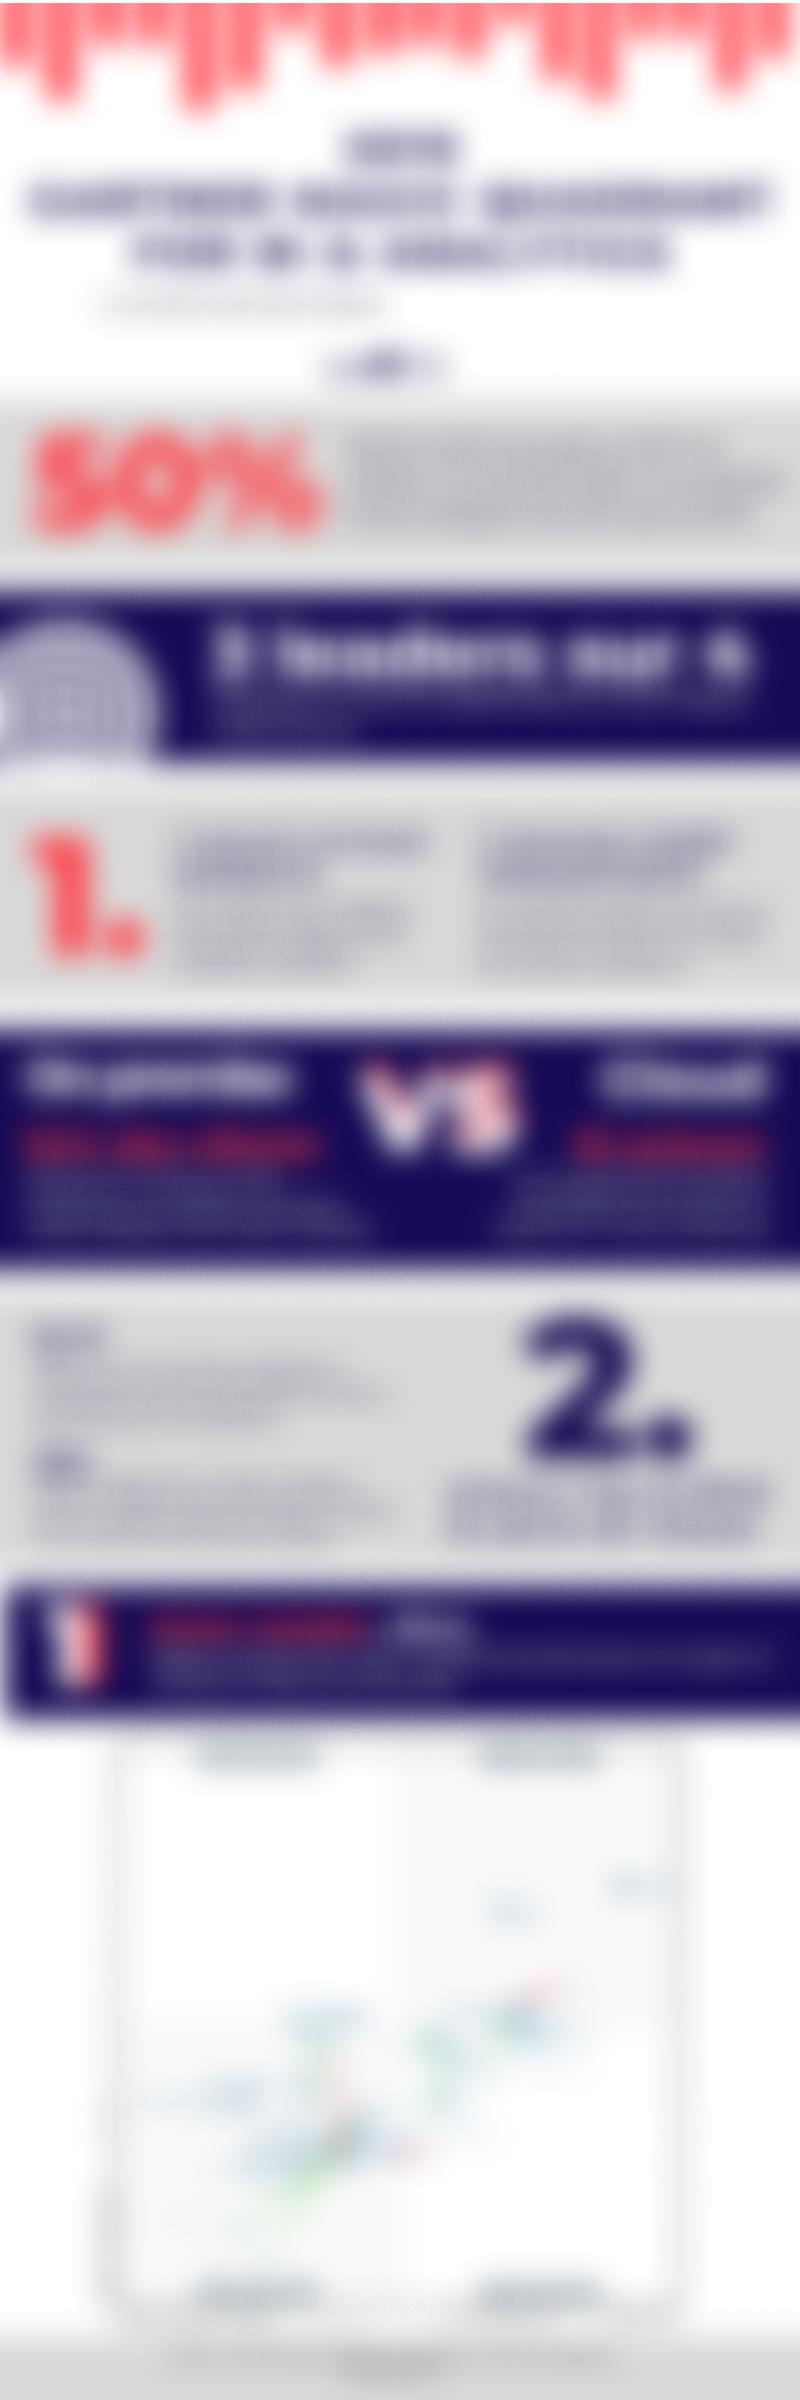 2019 Gartner Magic Quadrant Bi Analytics Infography